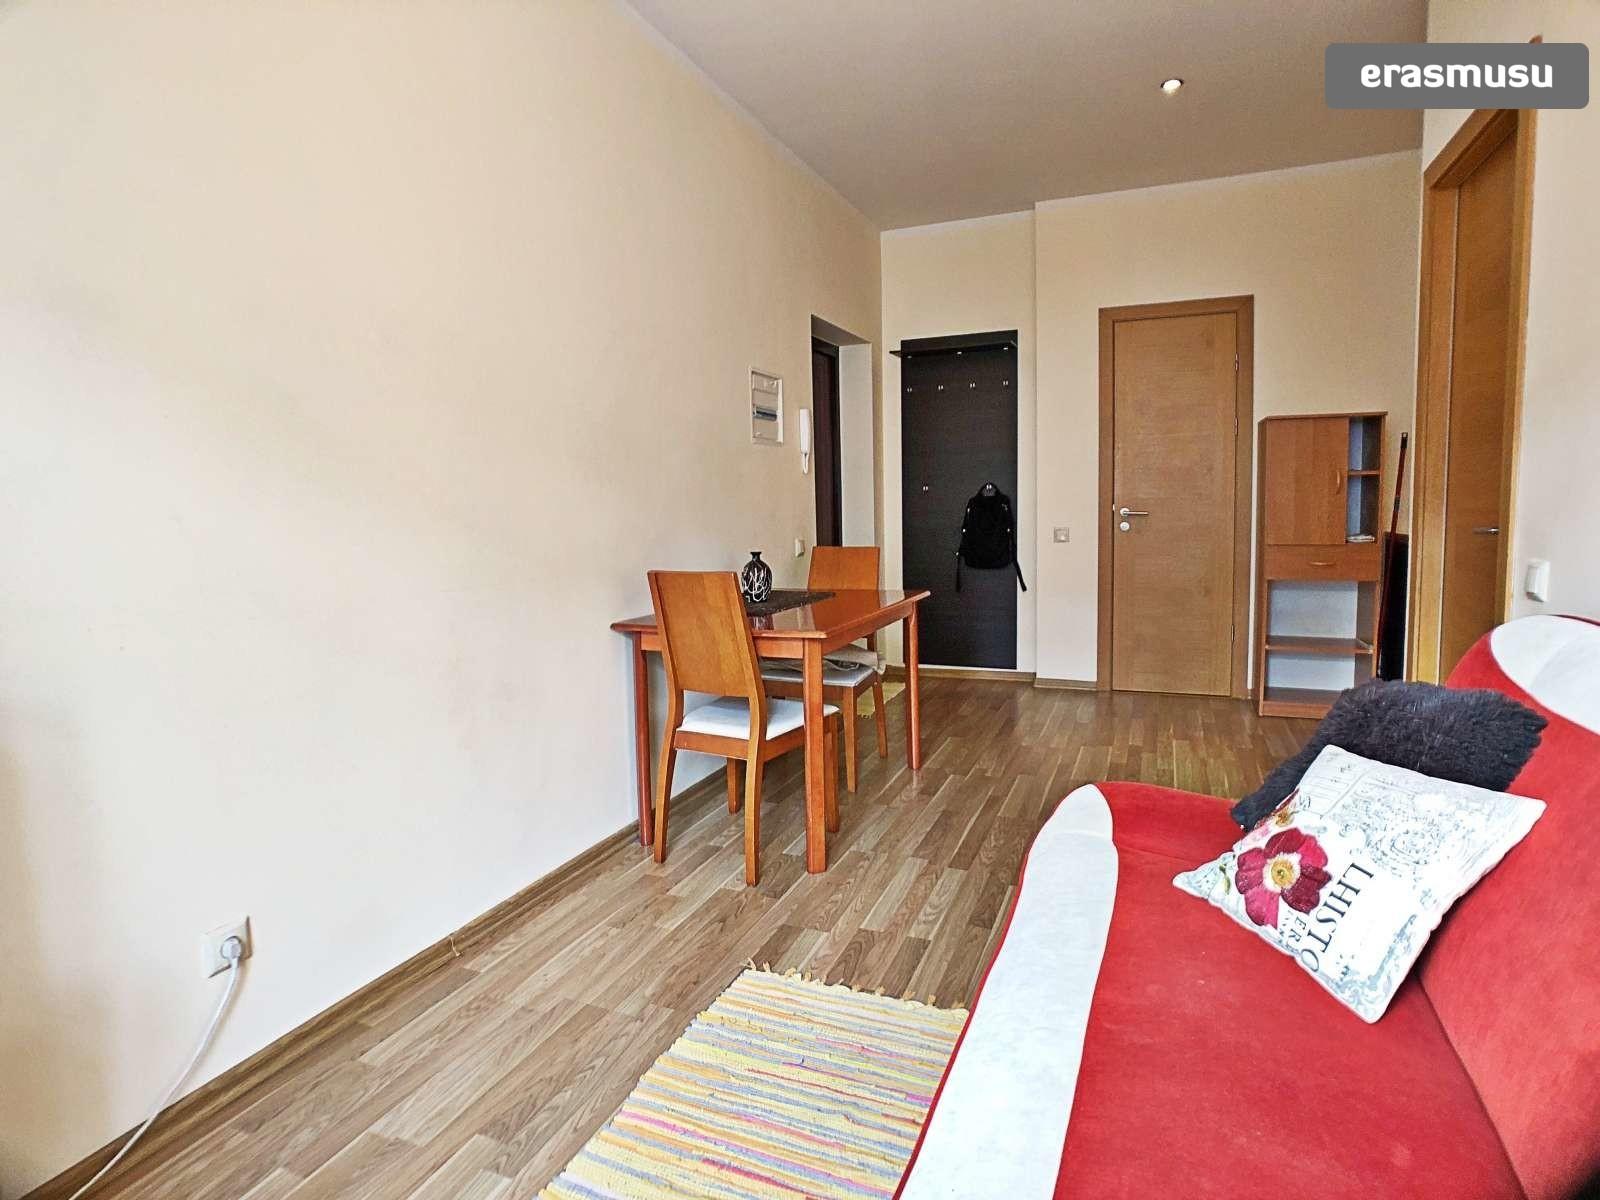 modern-1-bedroom-apartment-rent-maskavas-forstate-a6844c4e7d2619